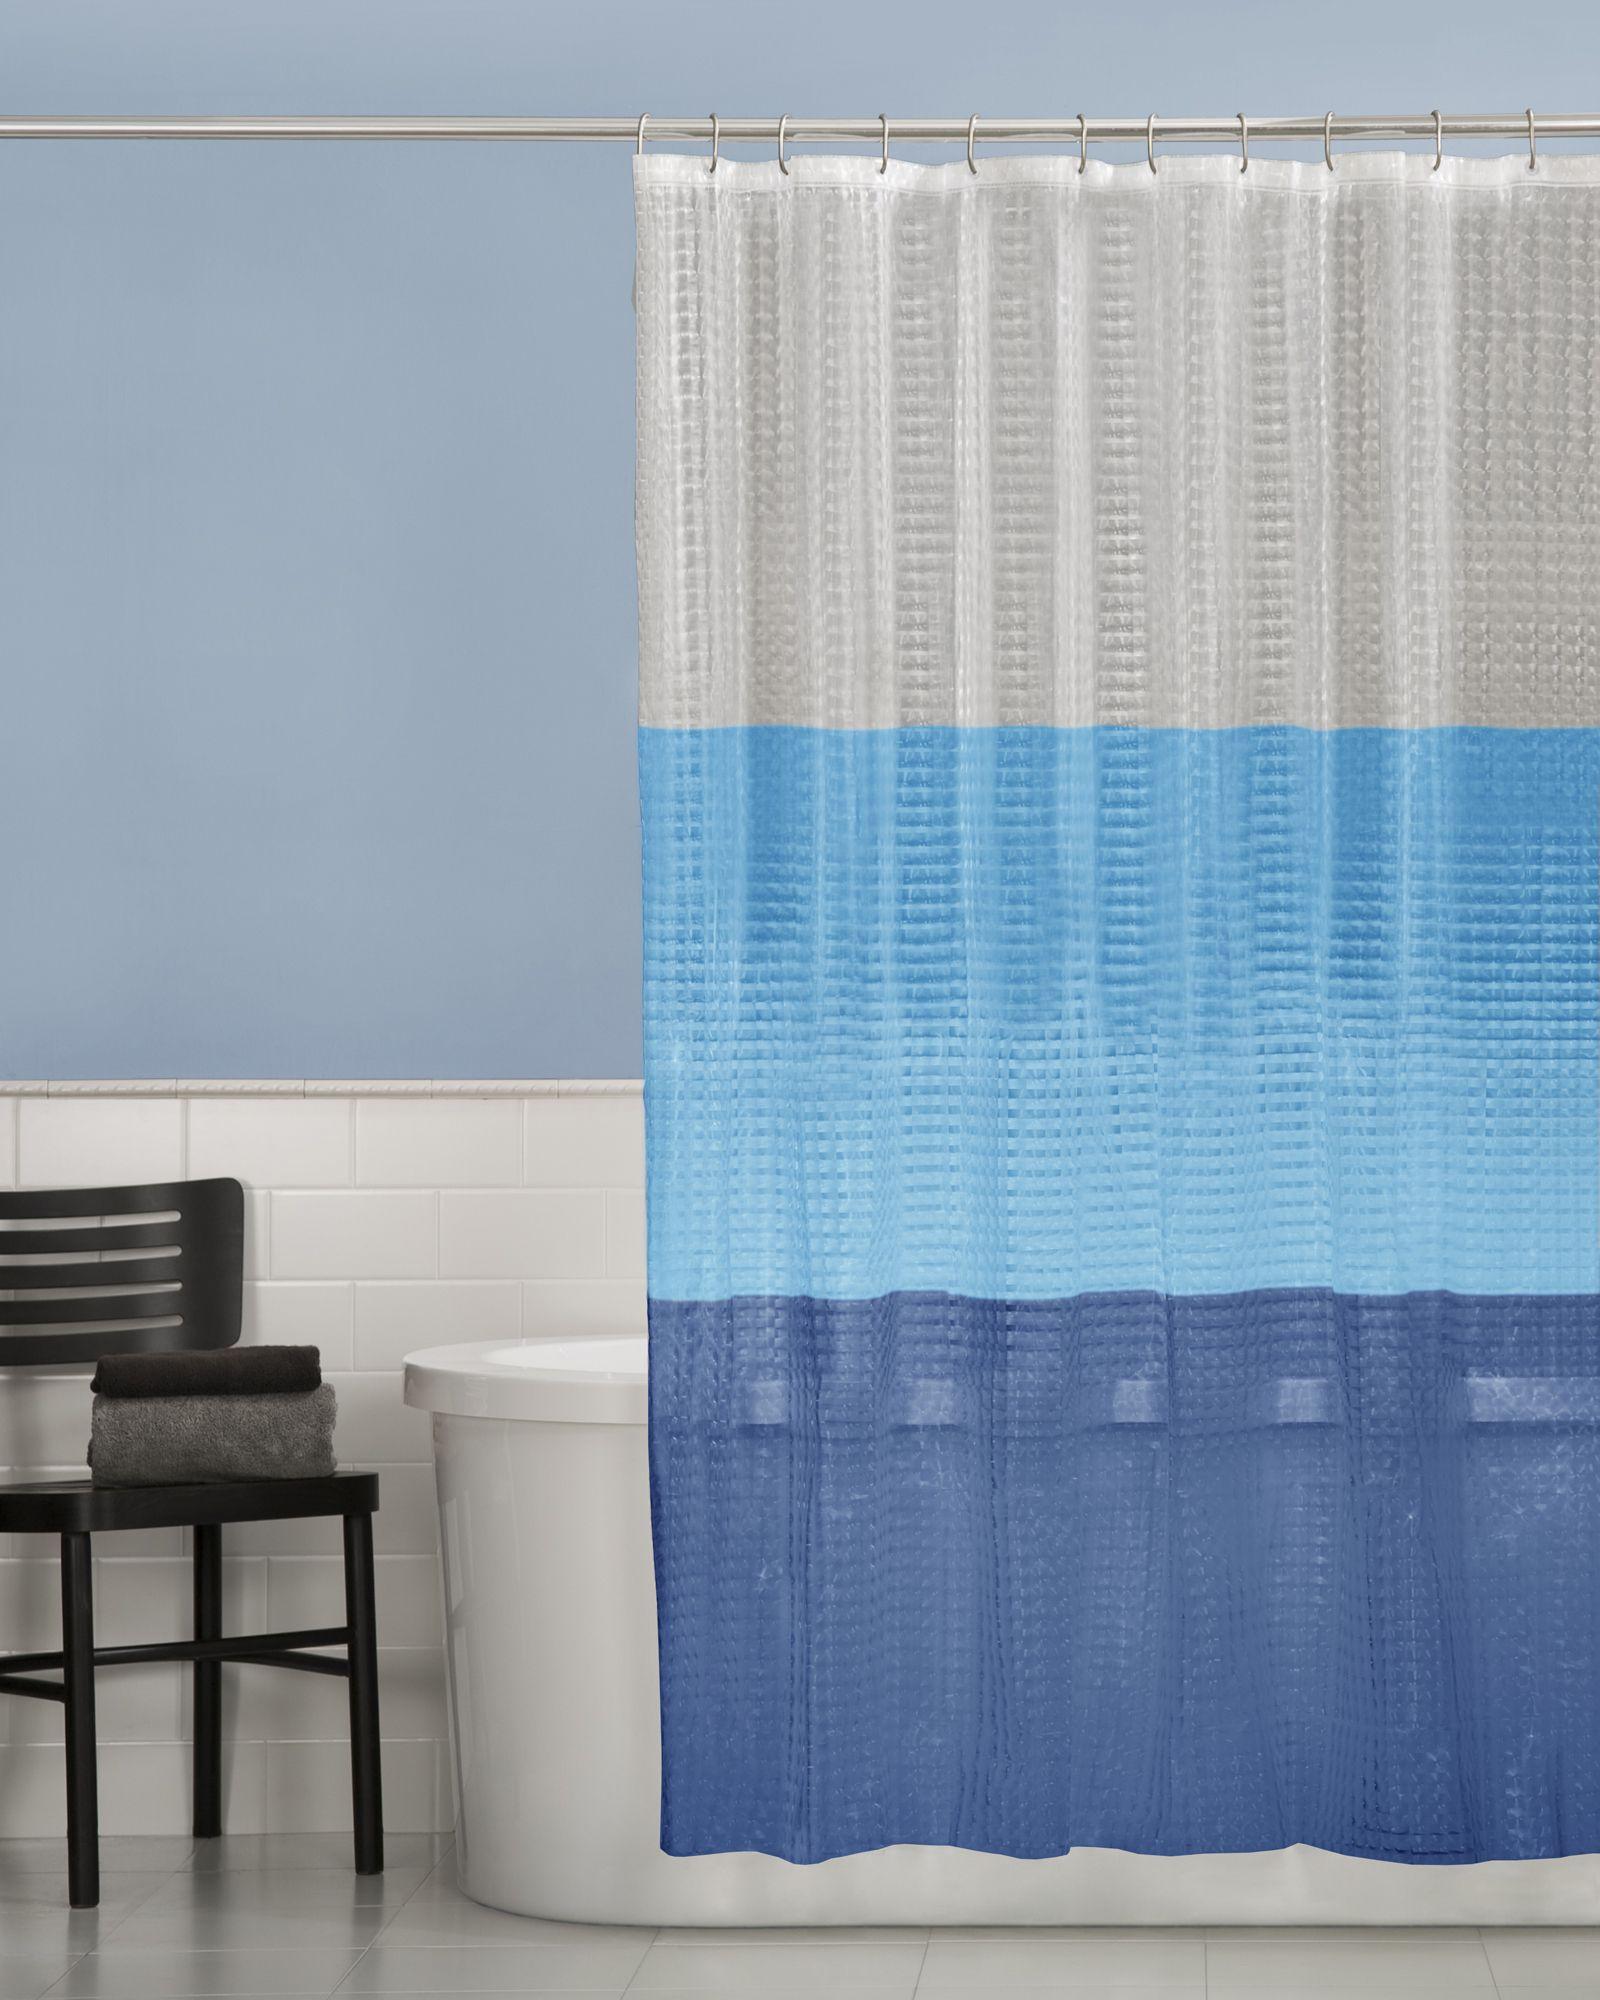 Maytex Color Block Shower Curtain | *Home & Garden* | Pinterest ...